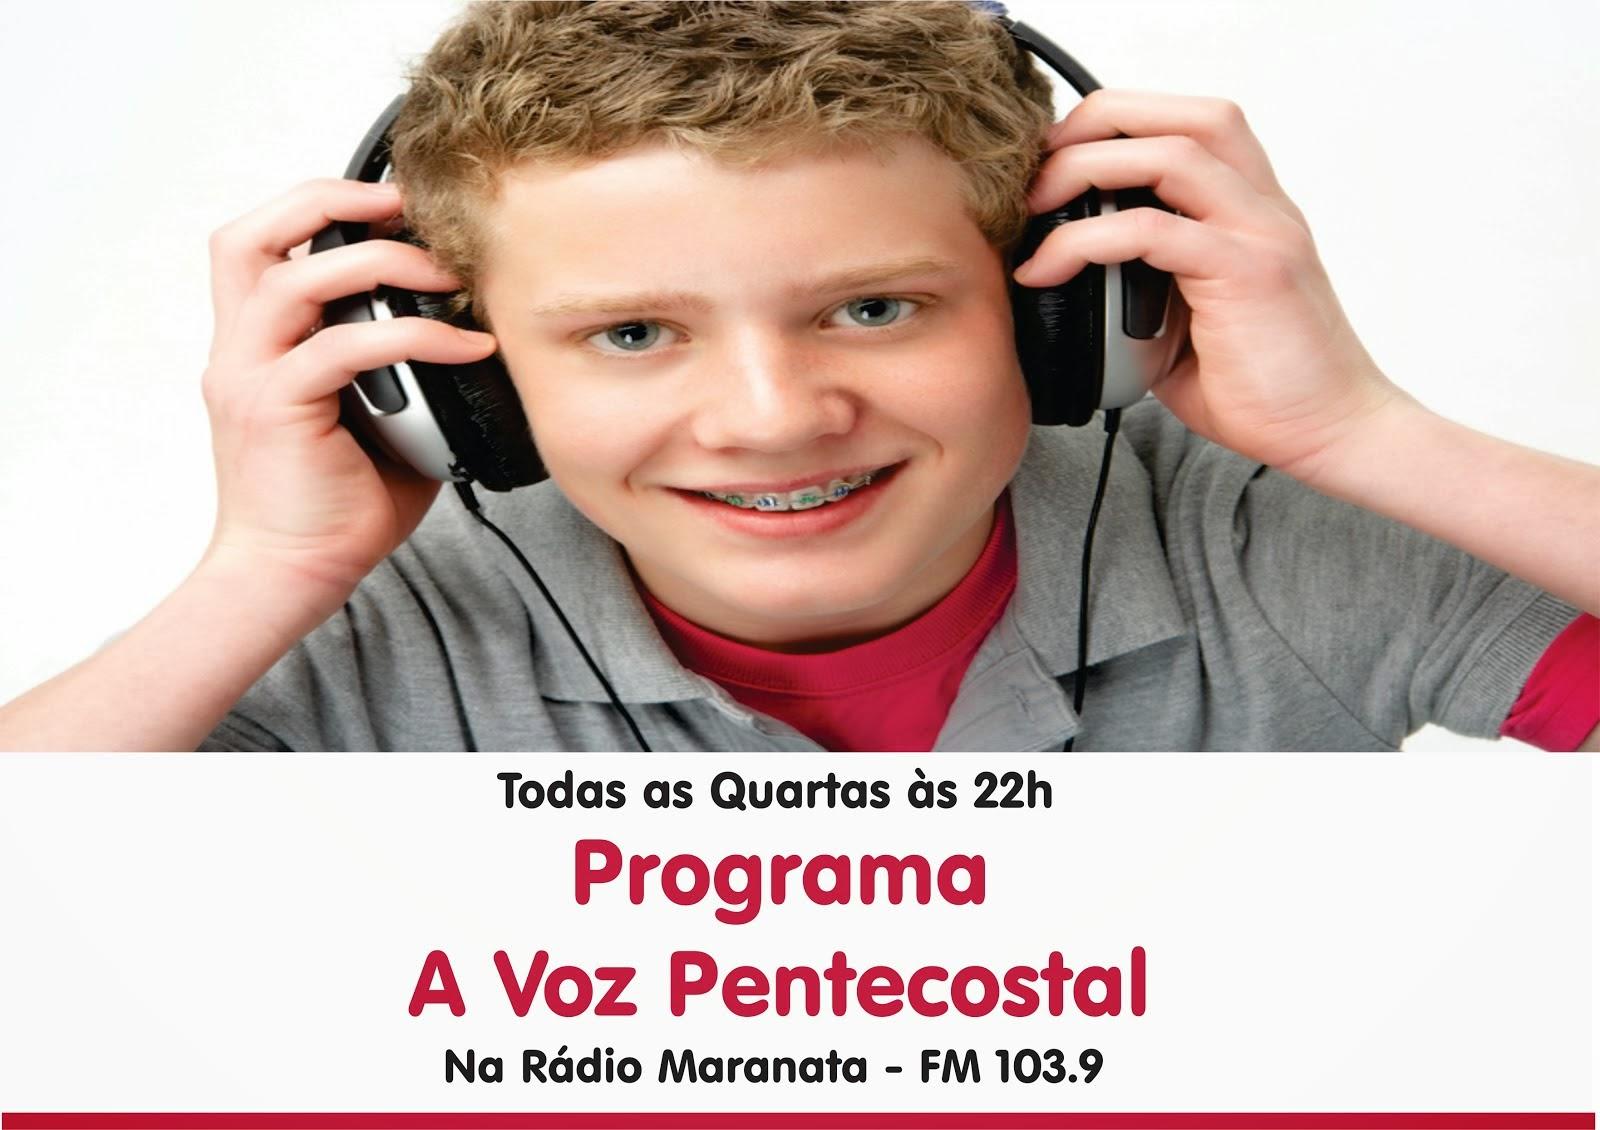 Programa A Voz Pentecostal